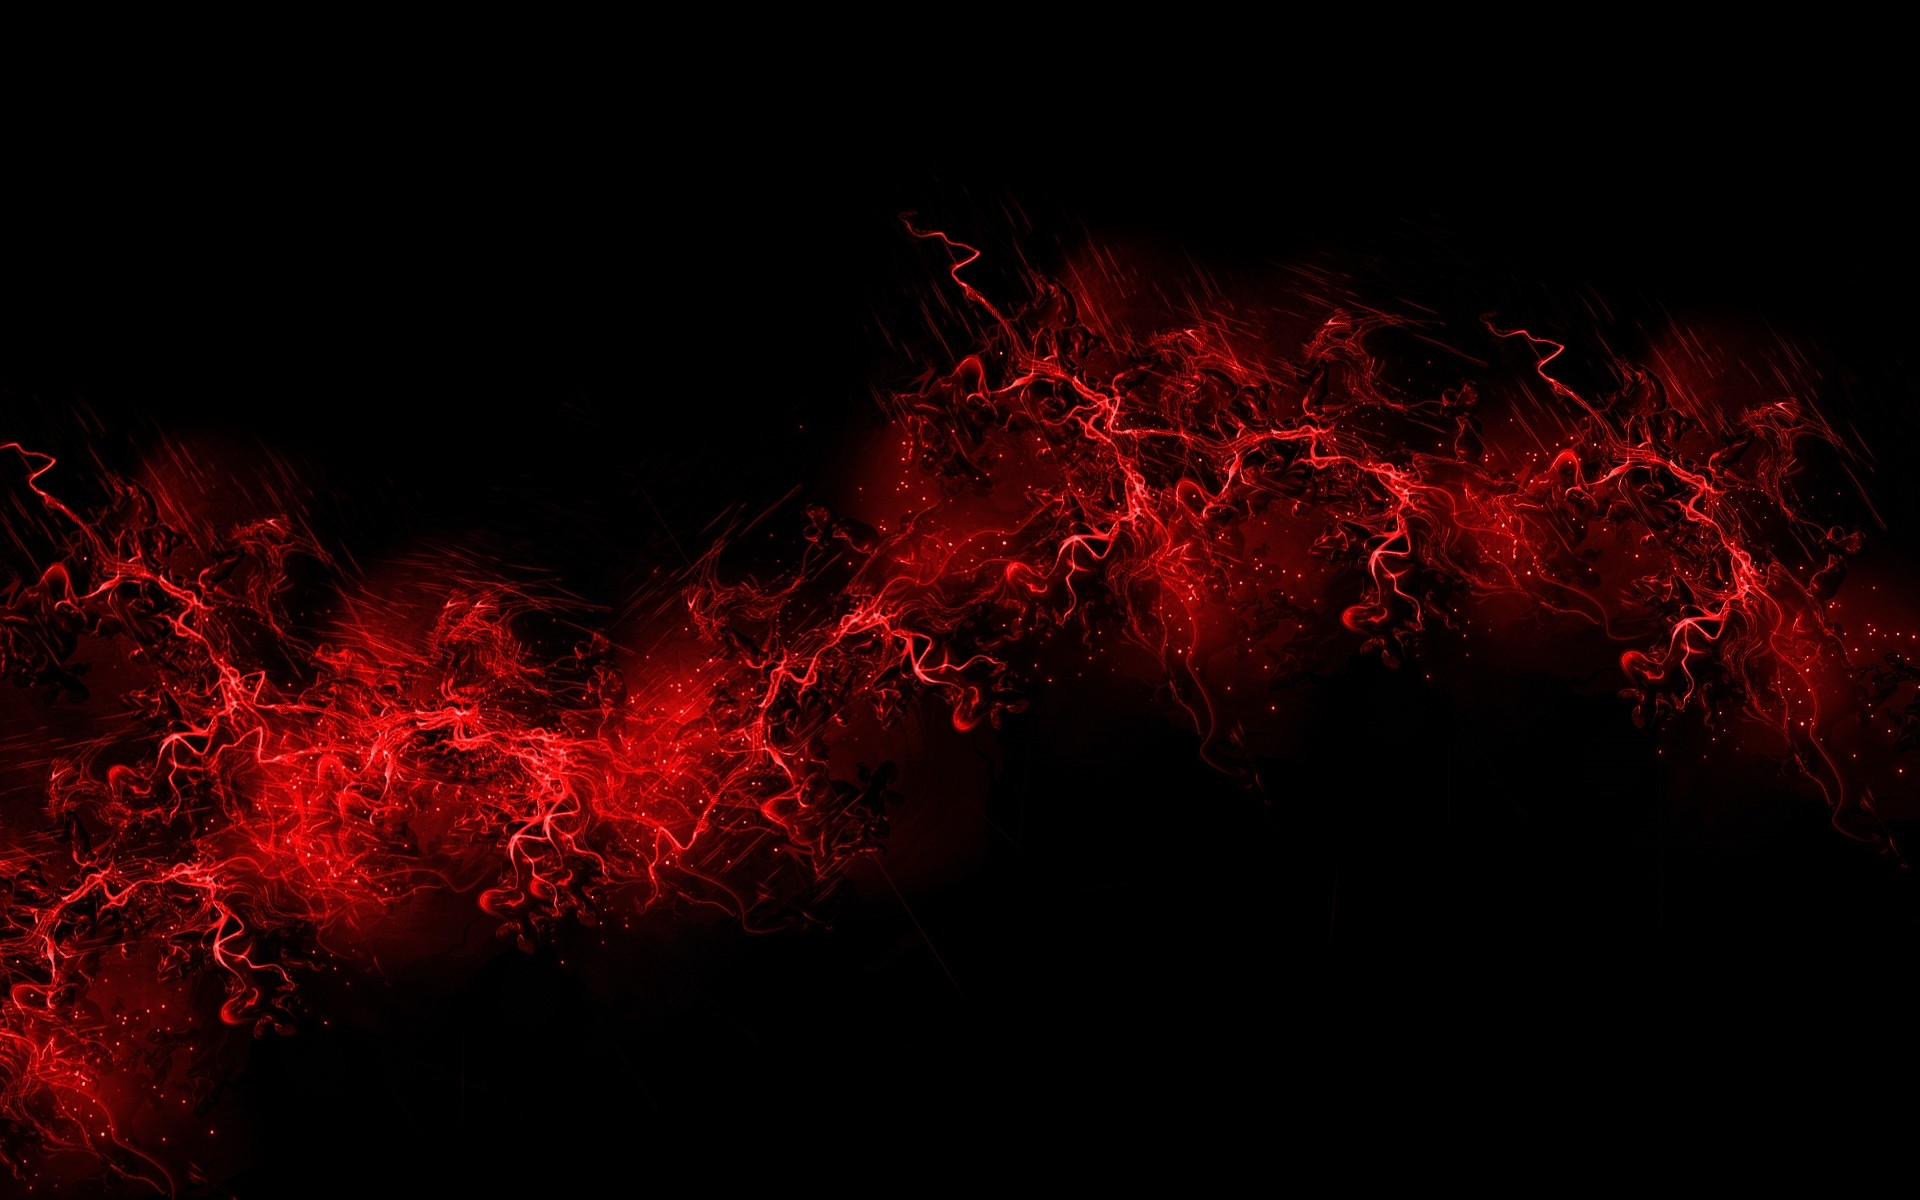 Red Wallpaper 7